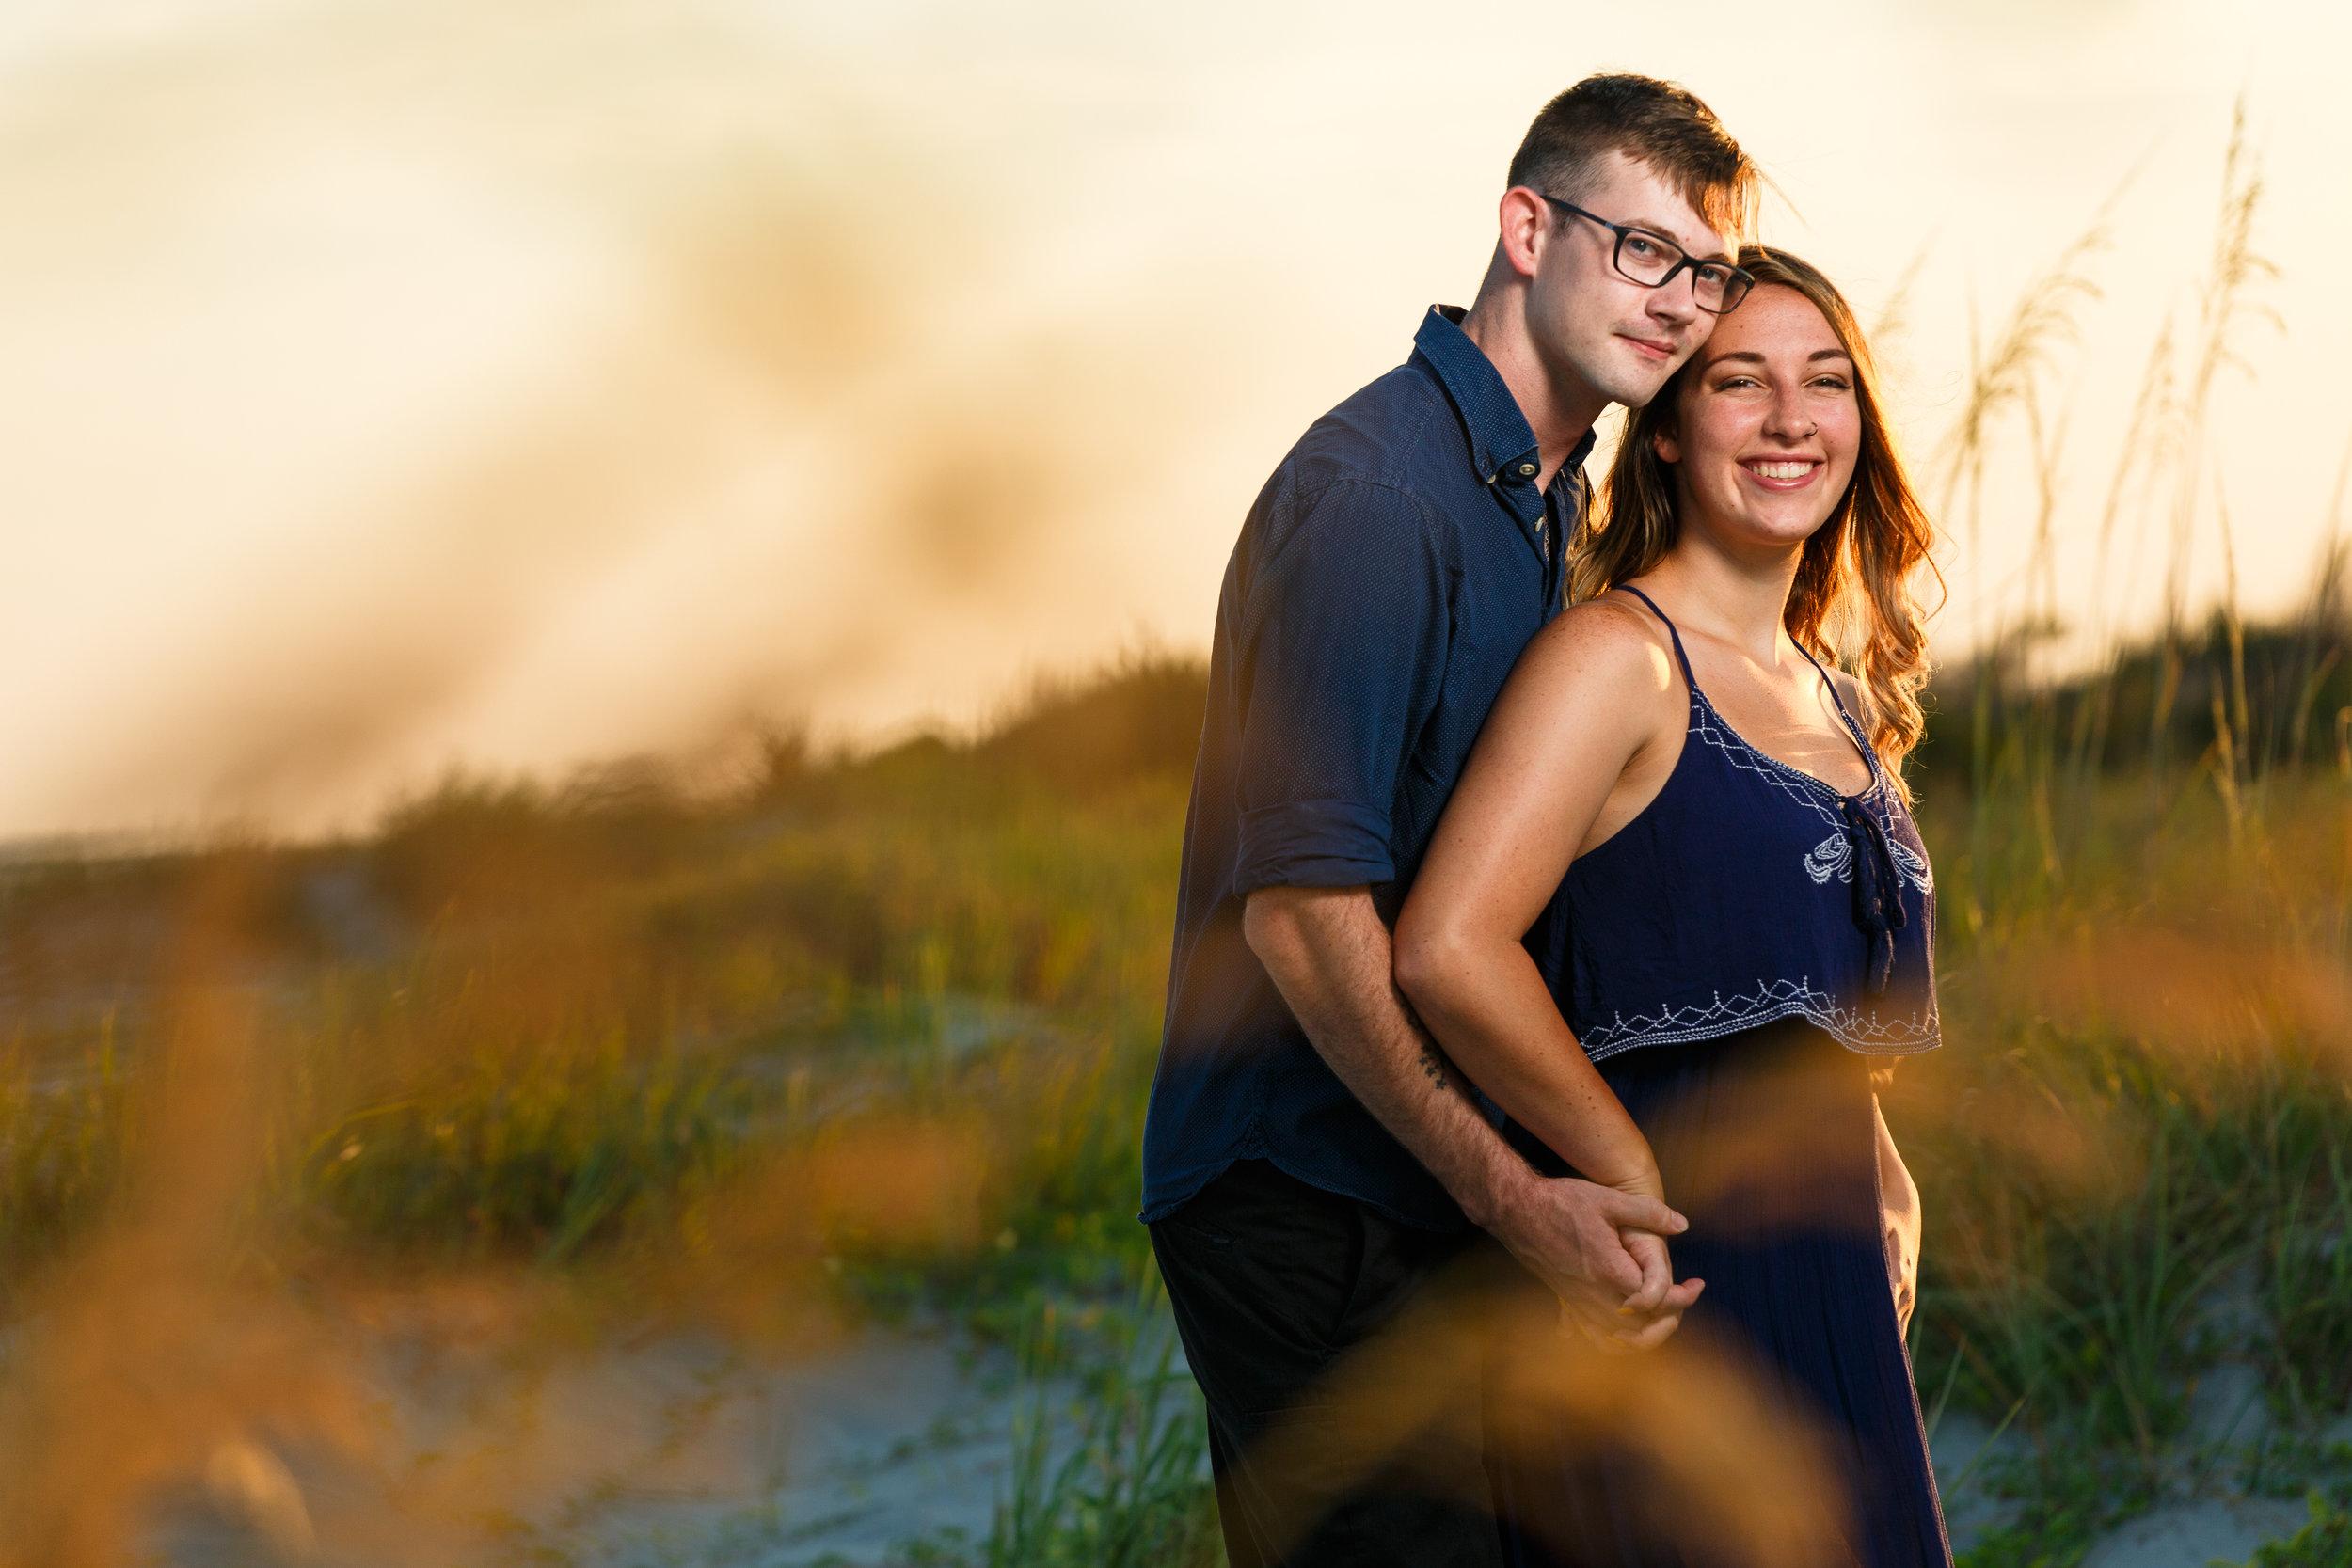 Couple in Beach Grass